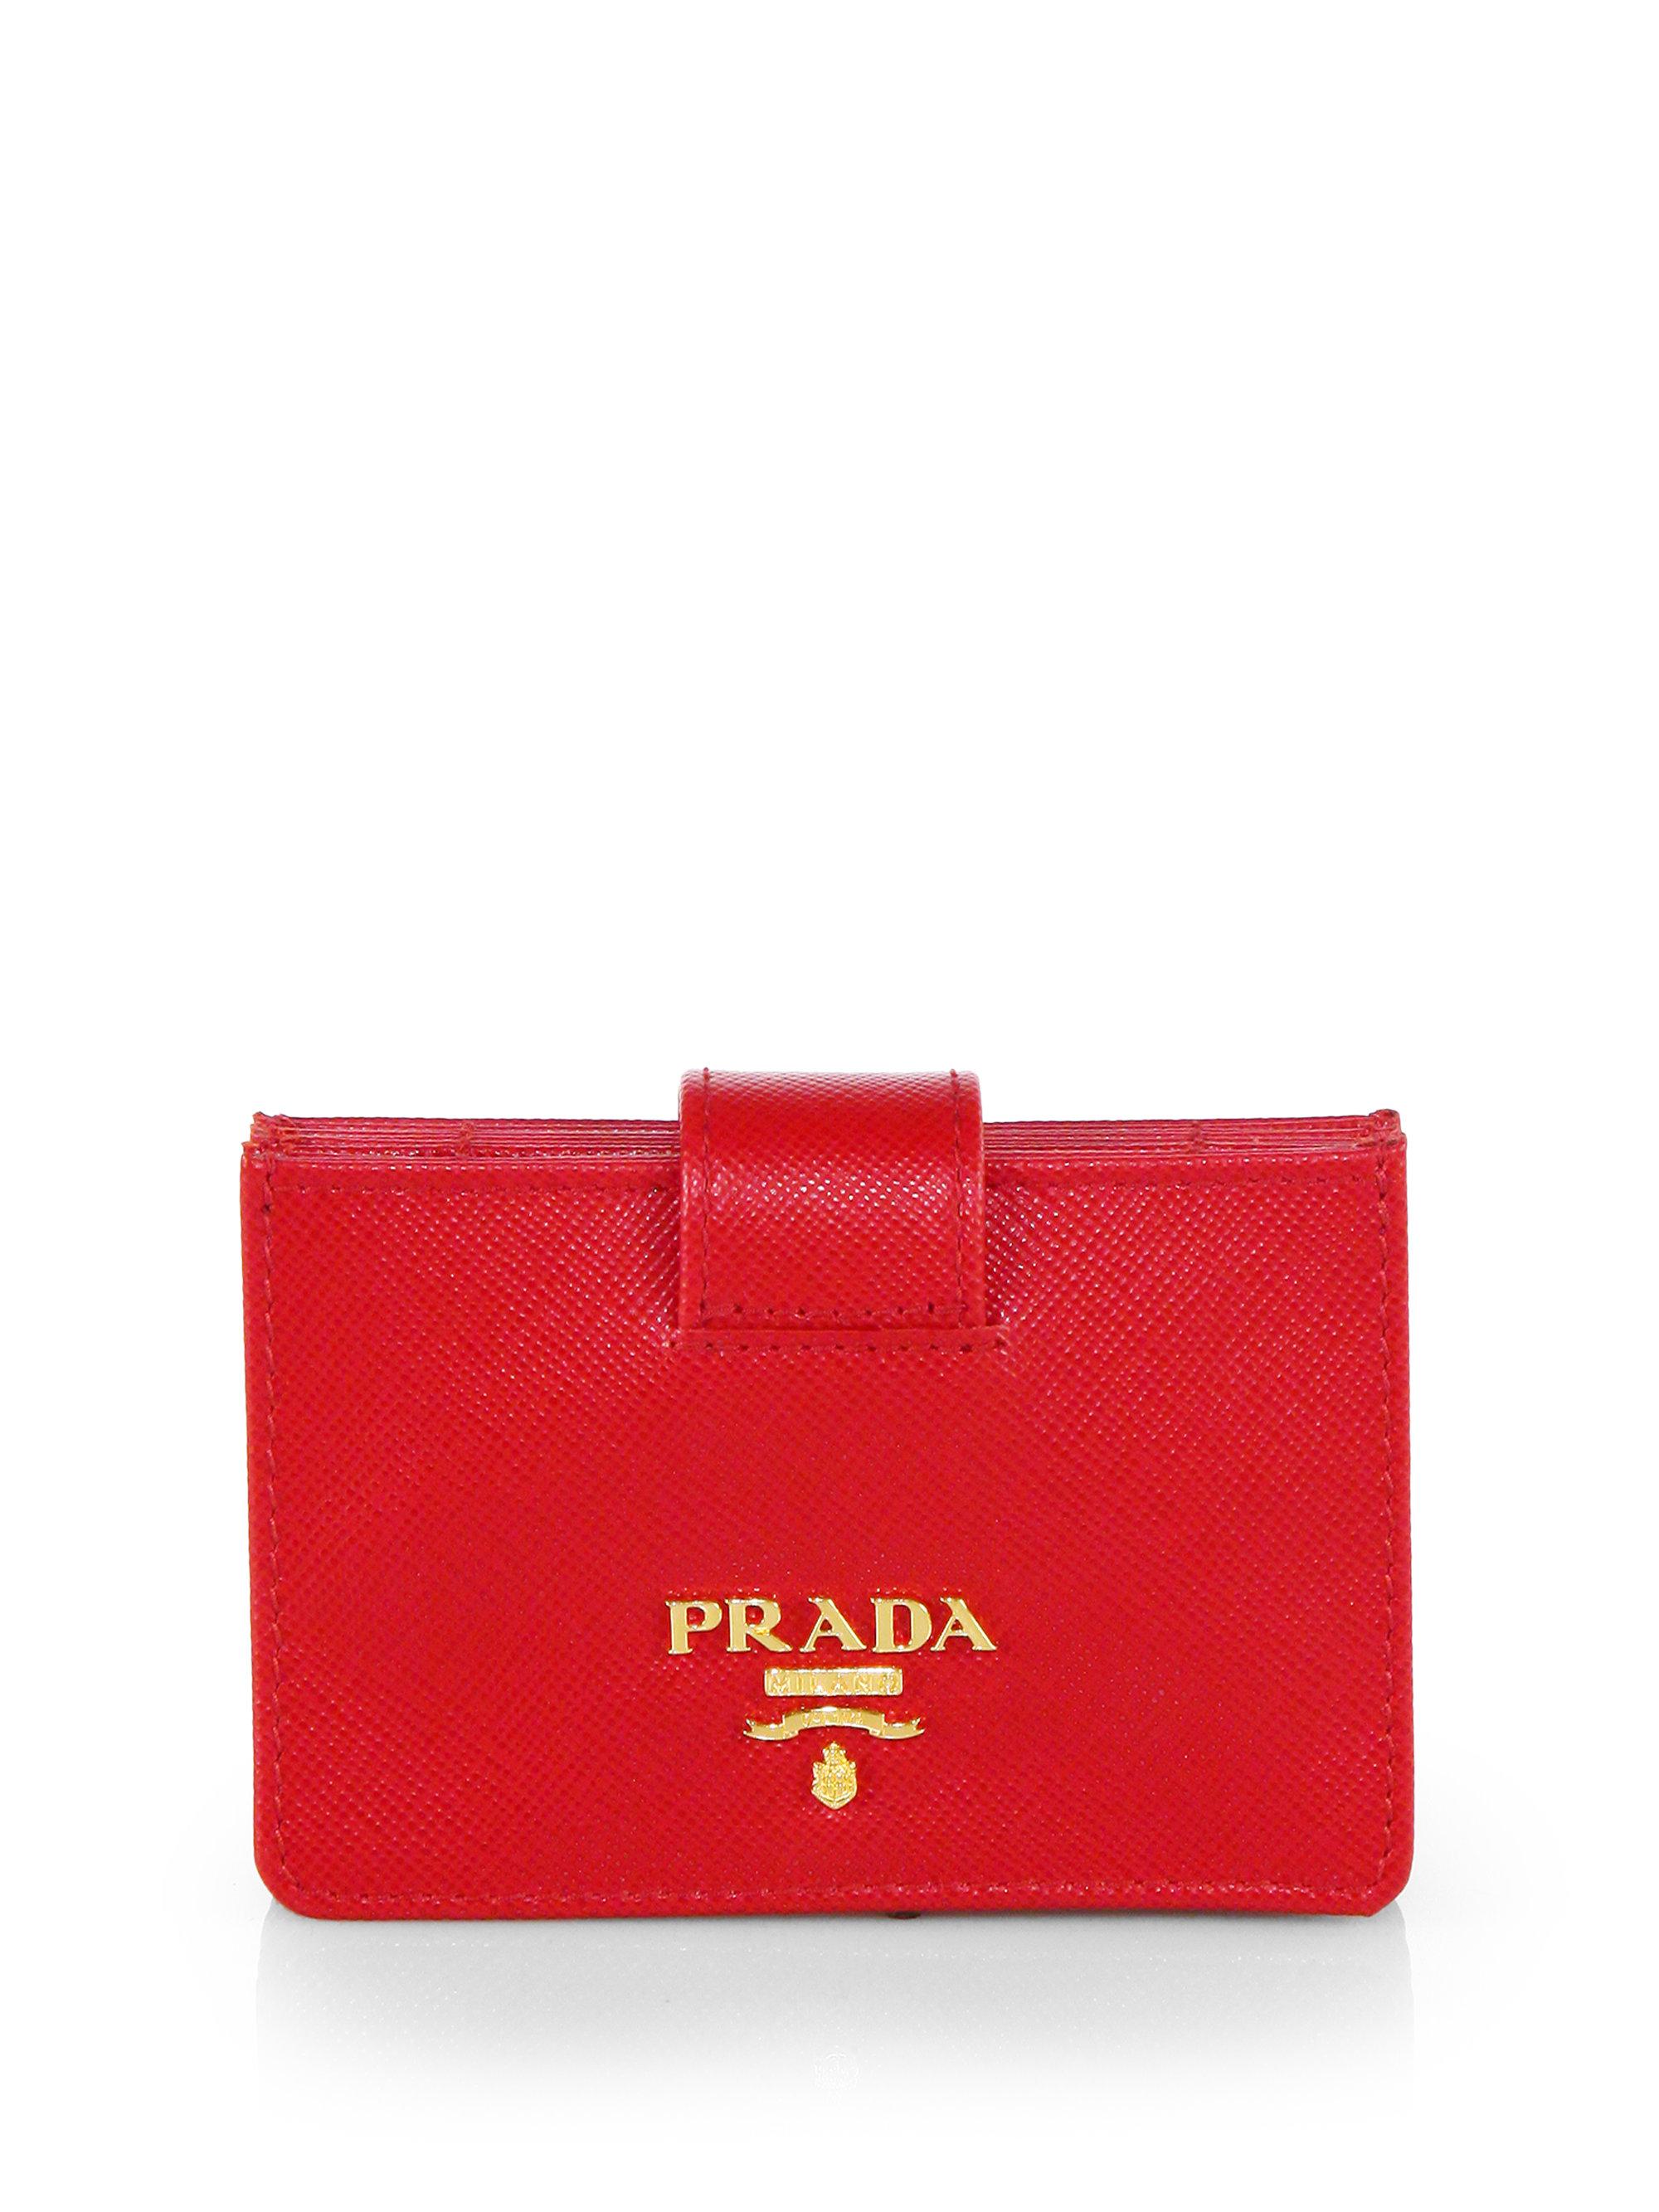 Lyst - Prada Saffiano Accordion Card Case in Red